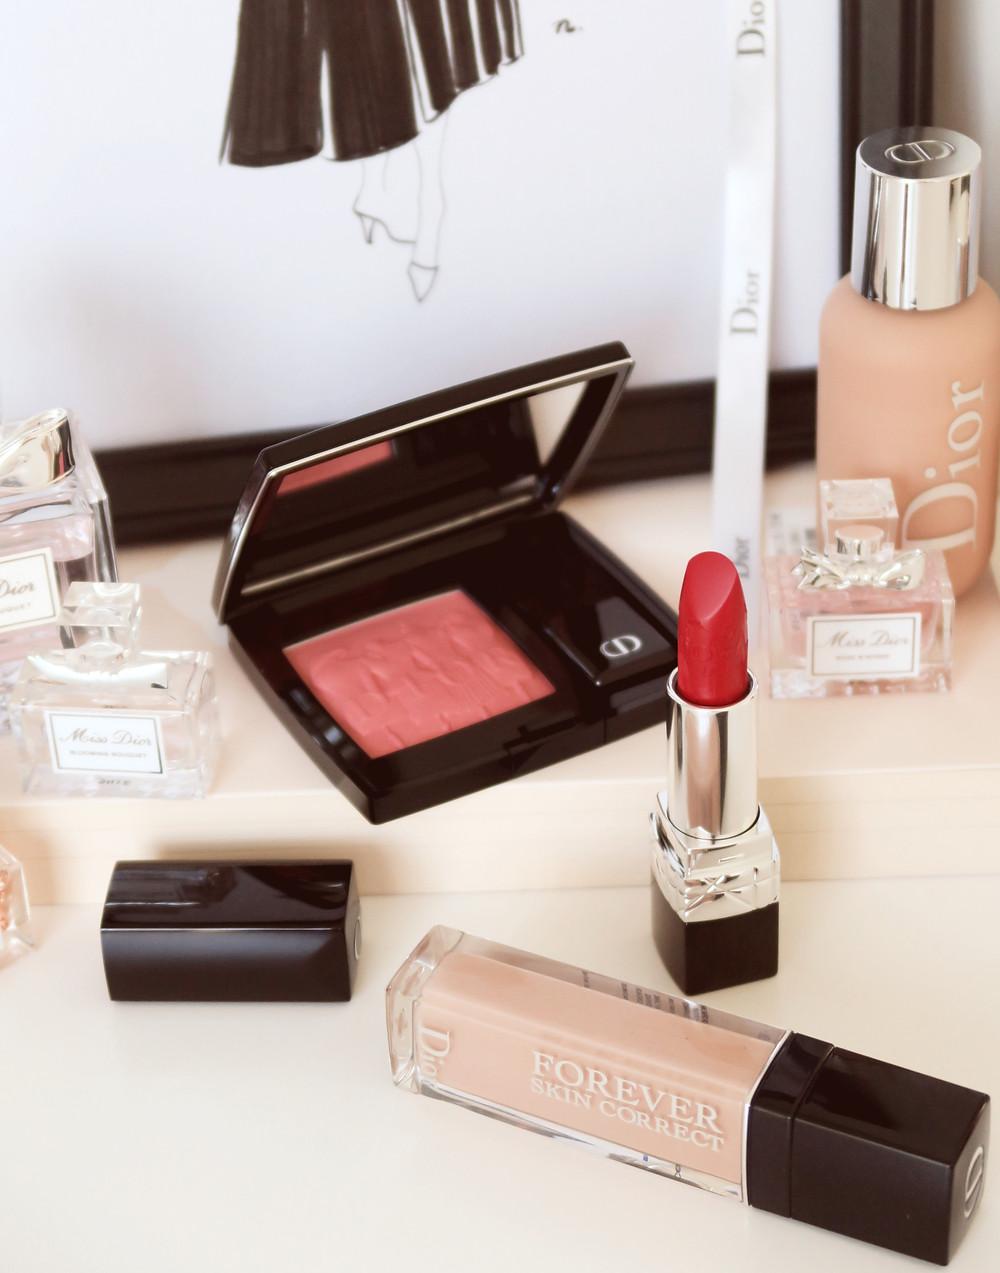 Dior Forever Skin Correct Concealer Review